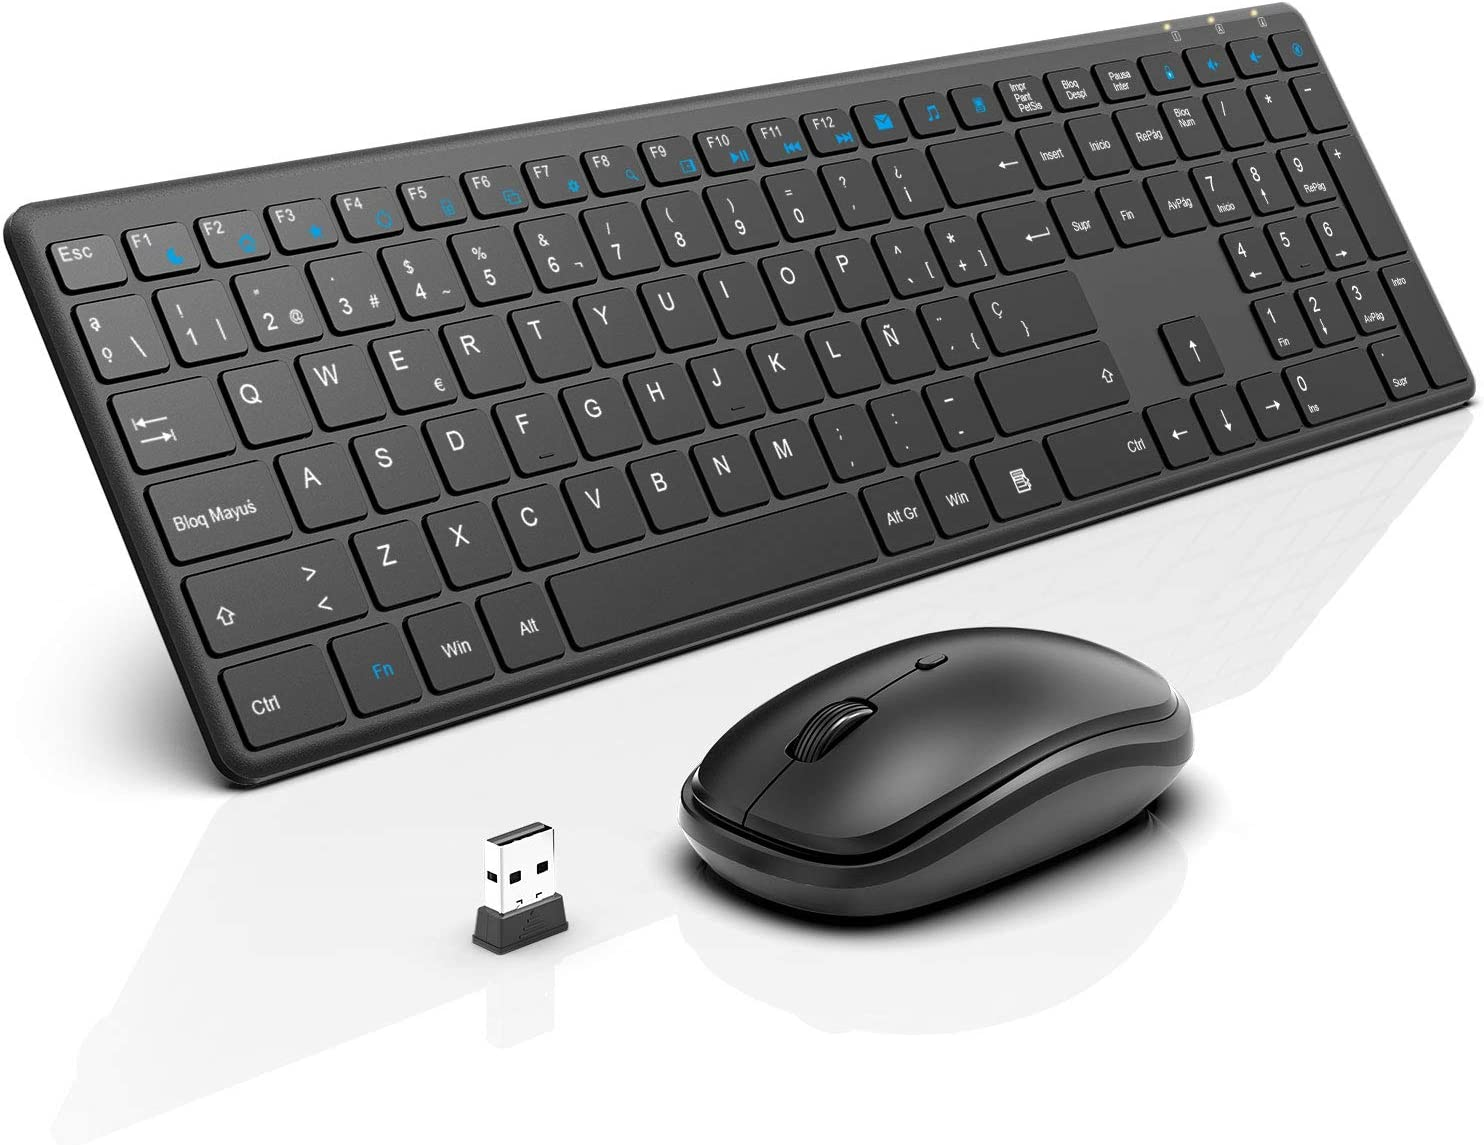 WisFox Combo de Teclado y Mouse Inalámbricos, 2.4G Mouse de Teclado Delgado de Tamaño Completo Packs con Receptor Nano para Windows, Computadora, Computadora de Escritorio, PC, Mac